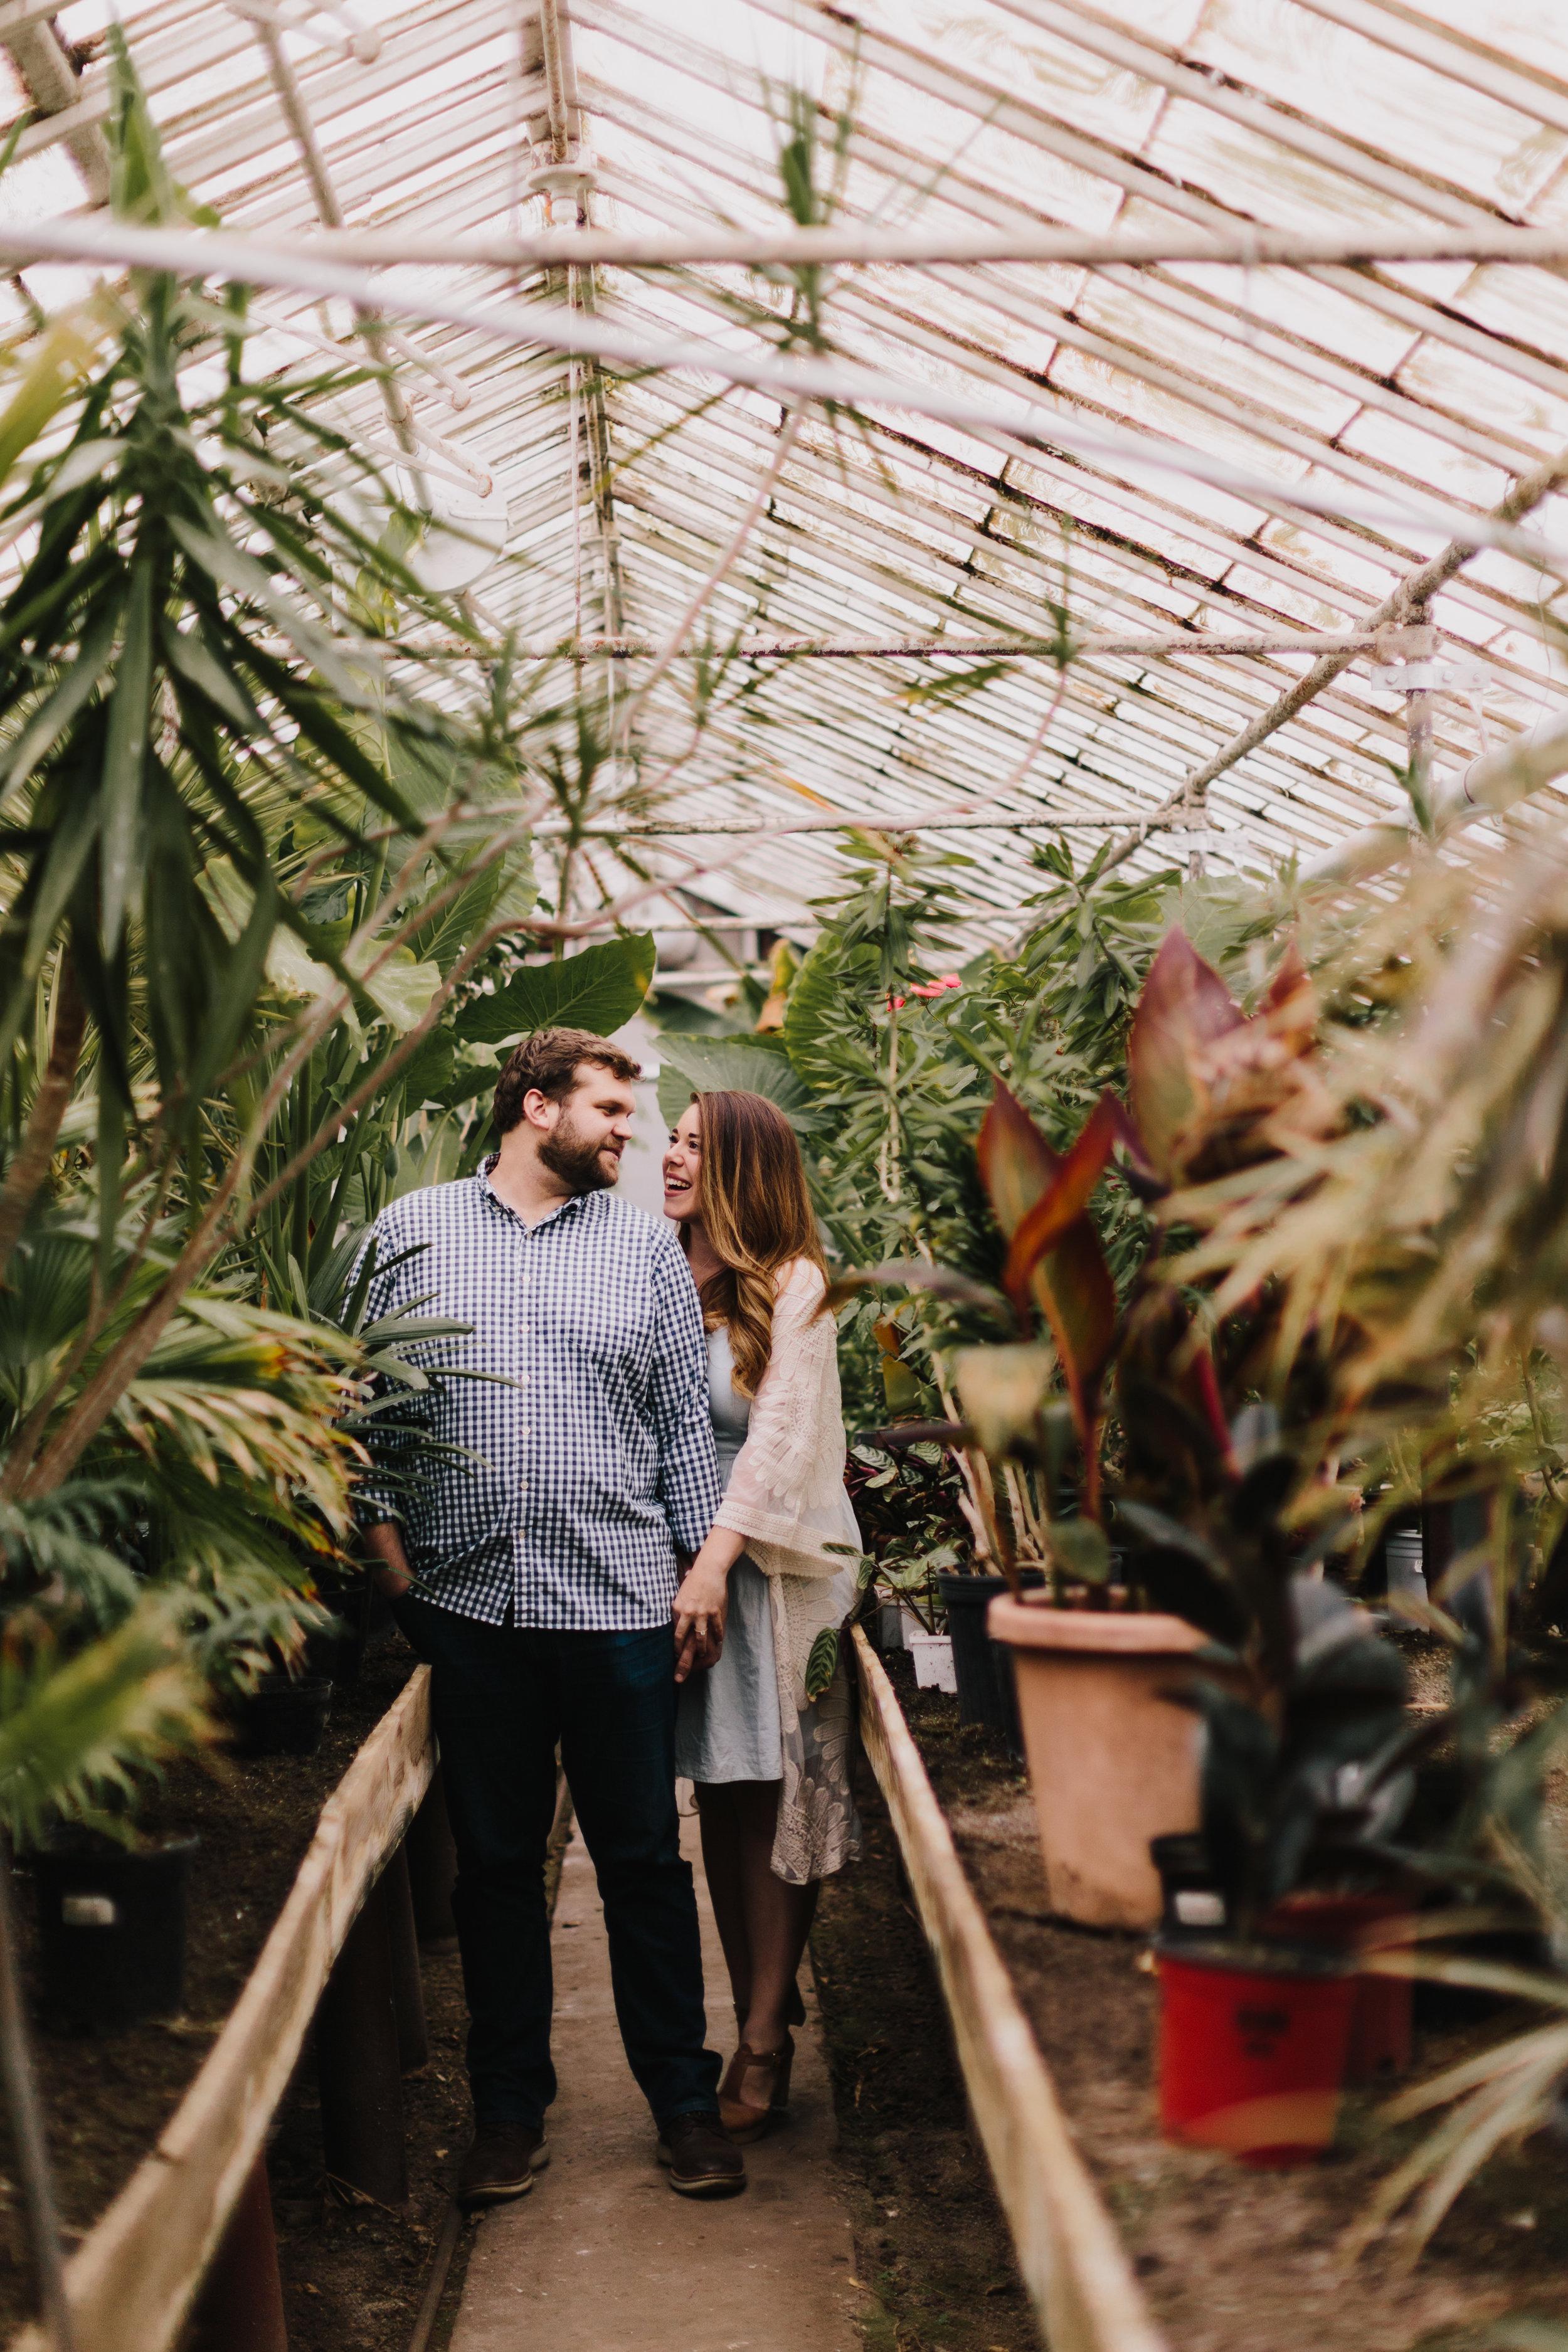 alyssa barletter photography greenhouse engagement photographer kansas city spring wedding-12.jpg